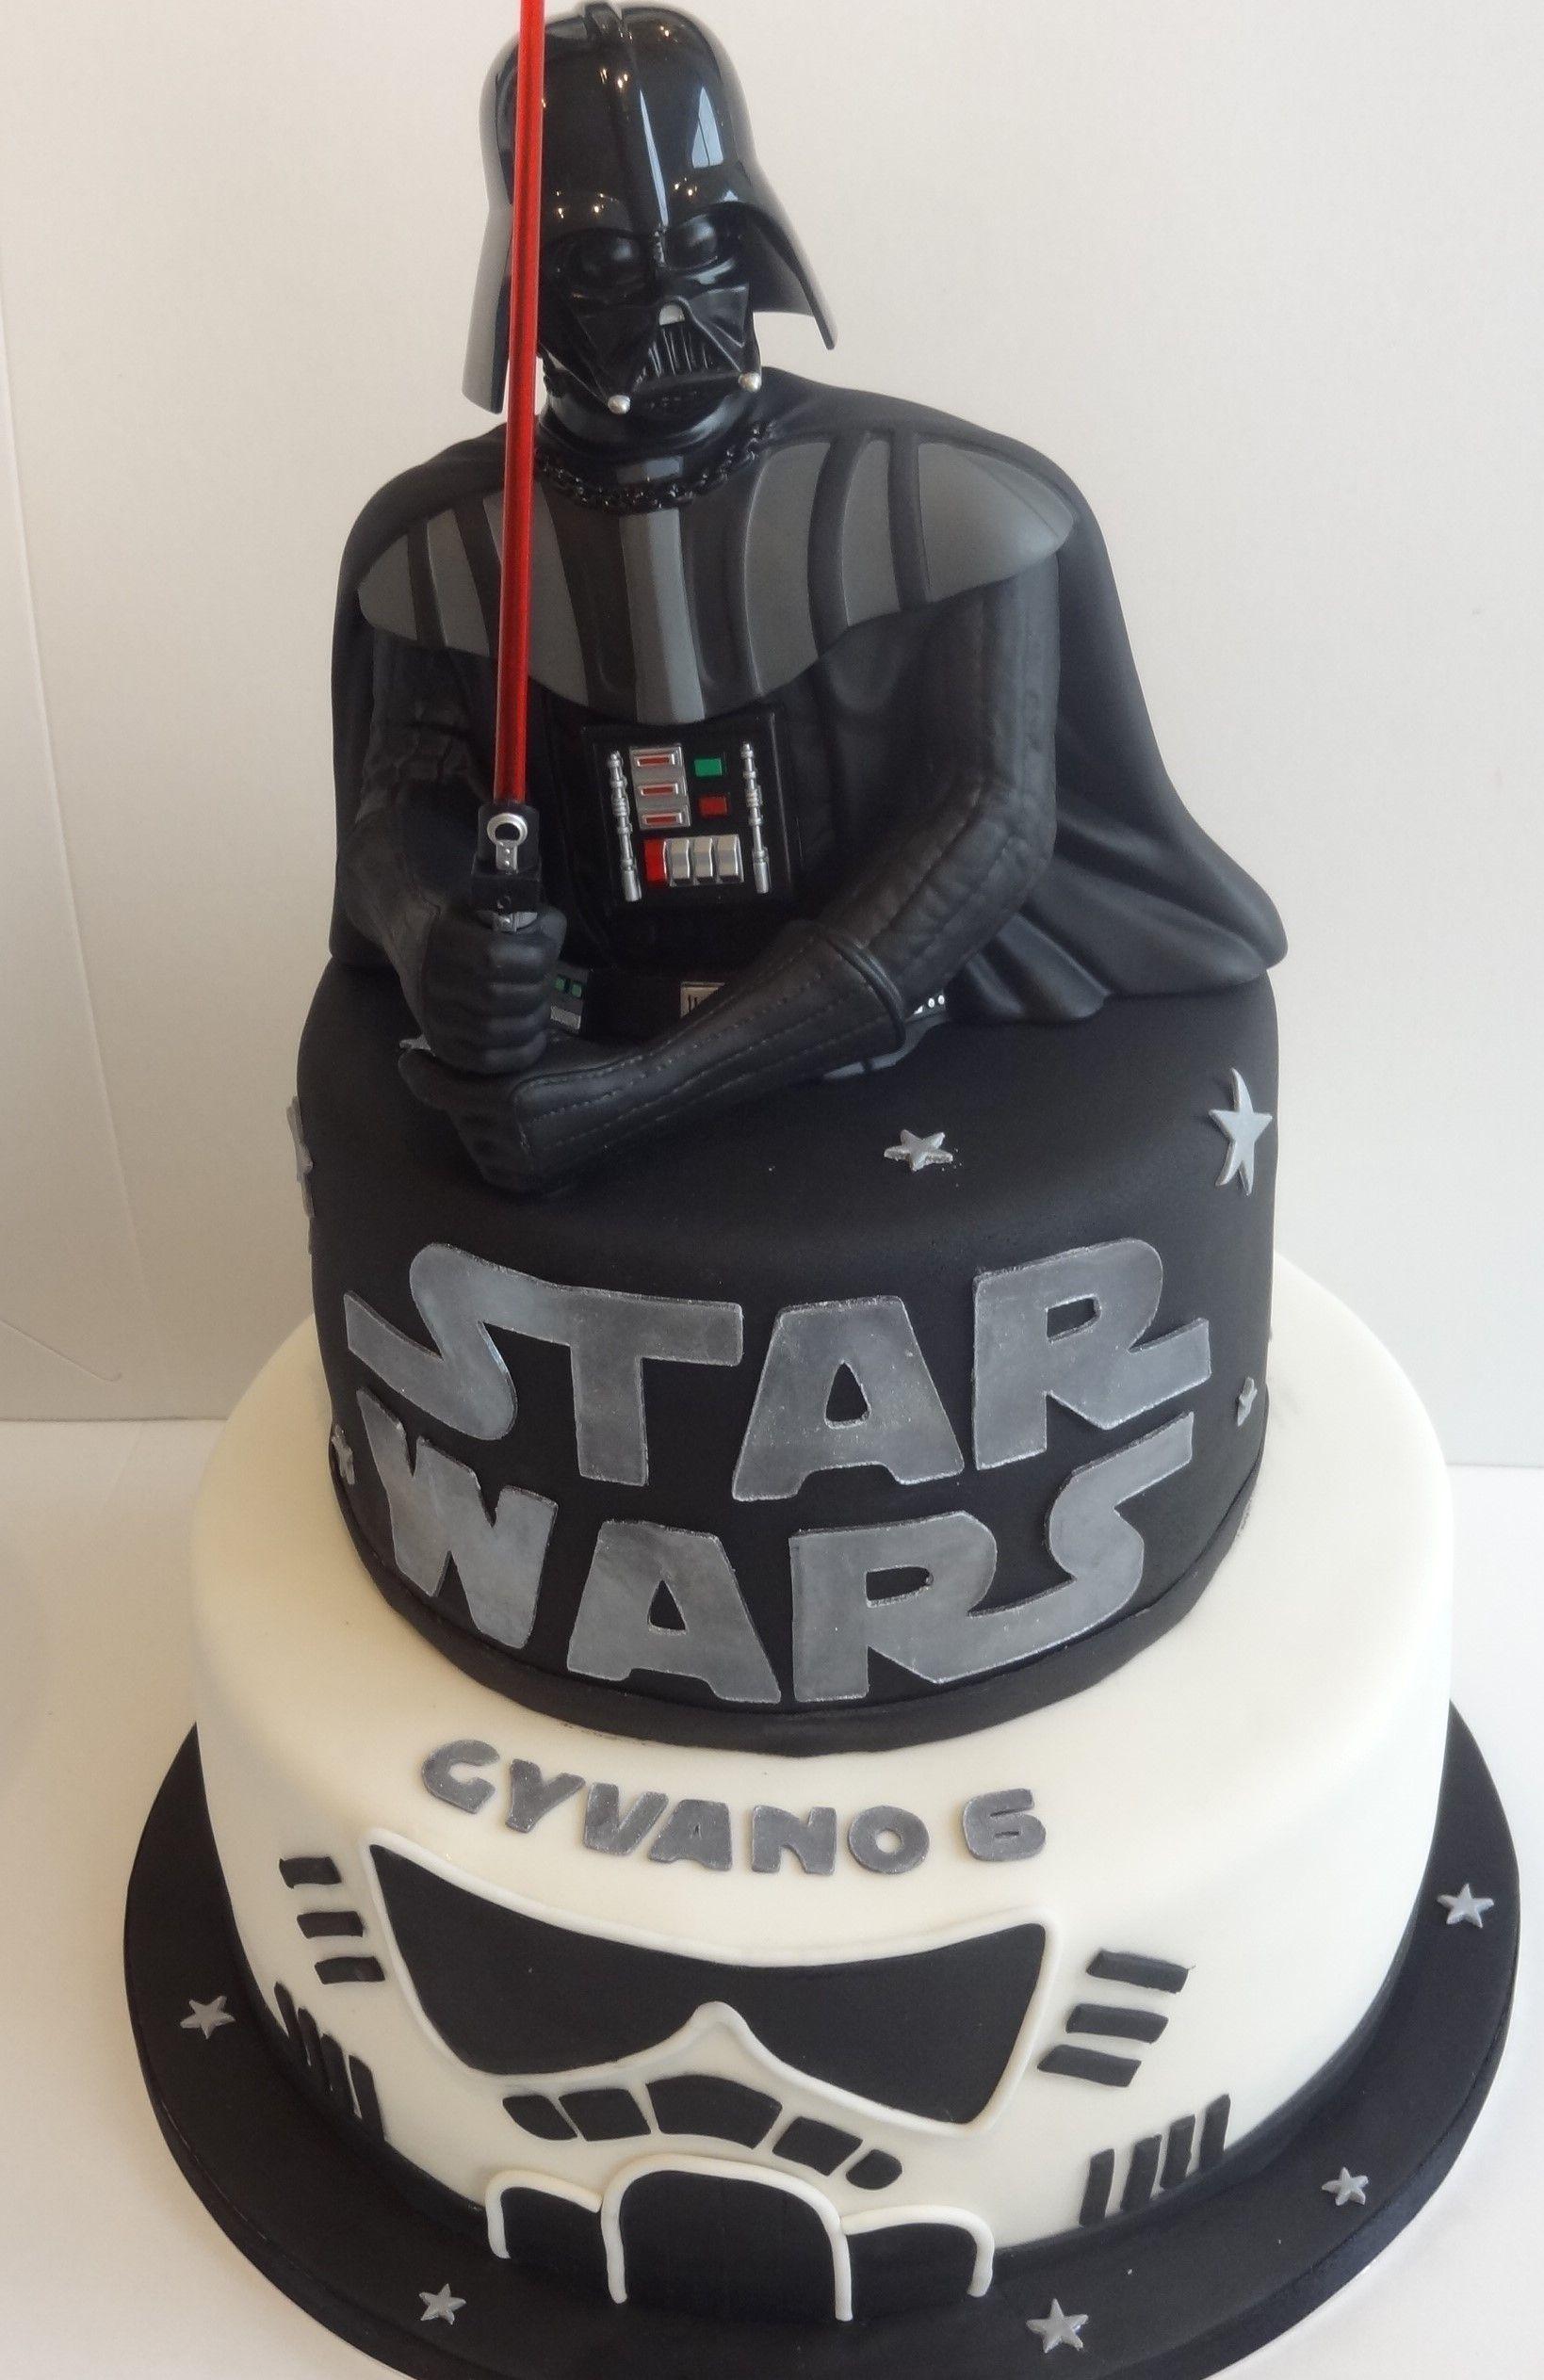 star wars cake for gyvano darth vader taarten van. Black Bedroom Furniture Sets. Home Design Ideas